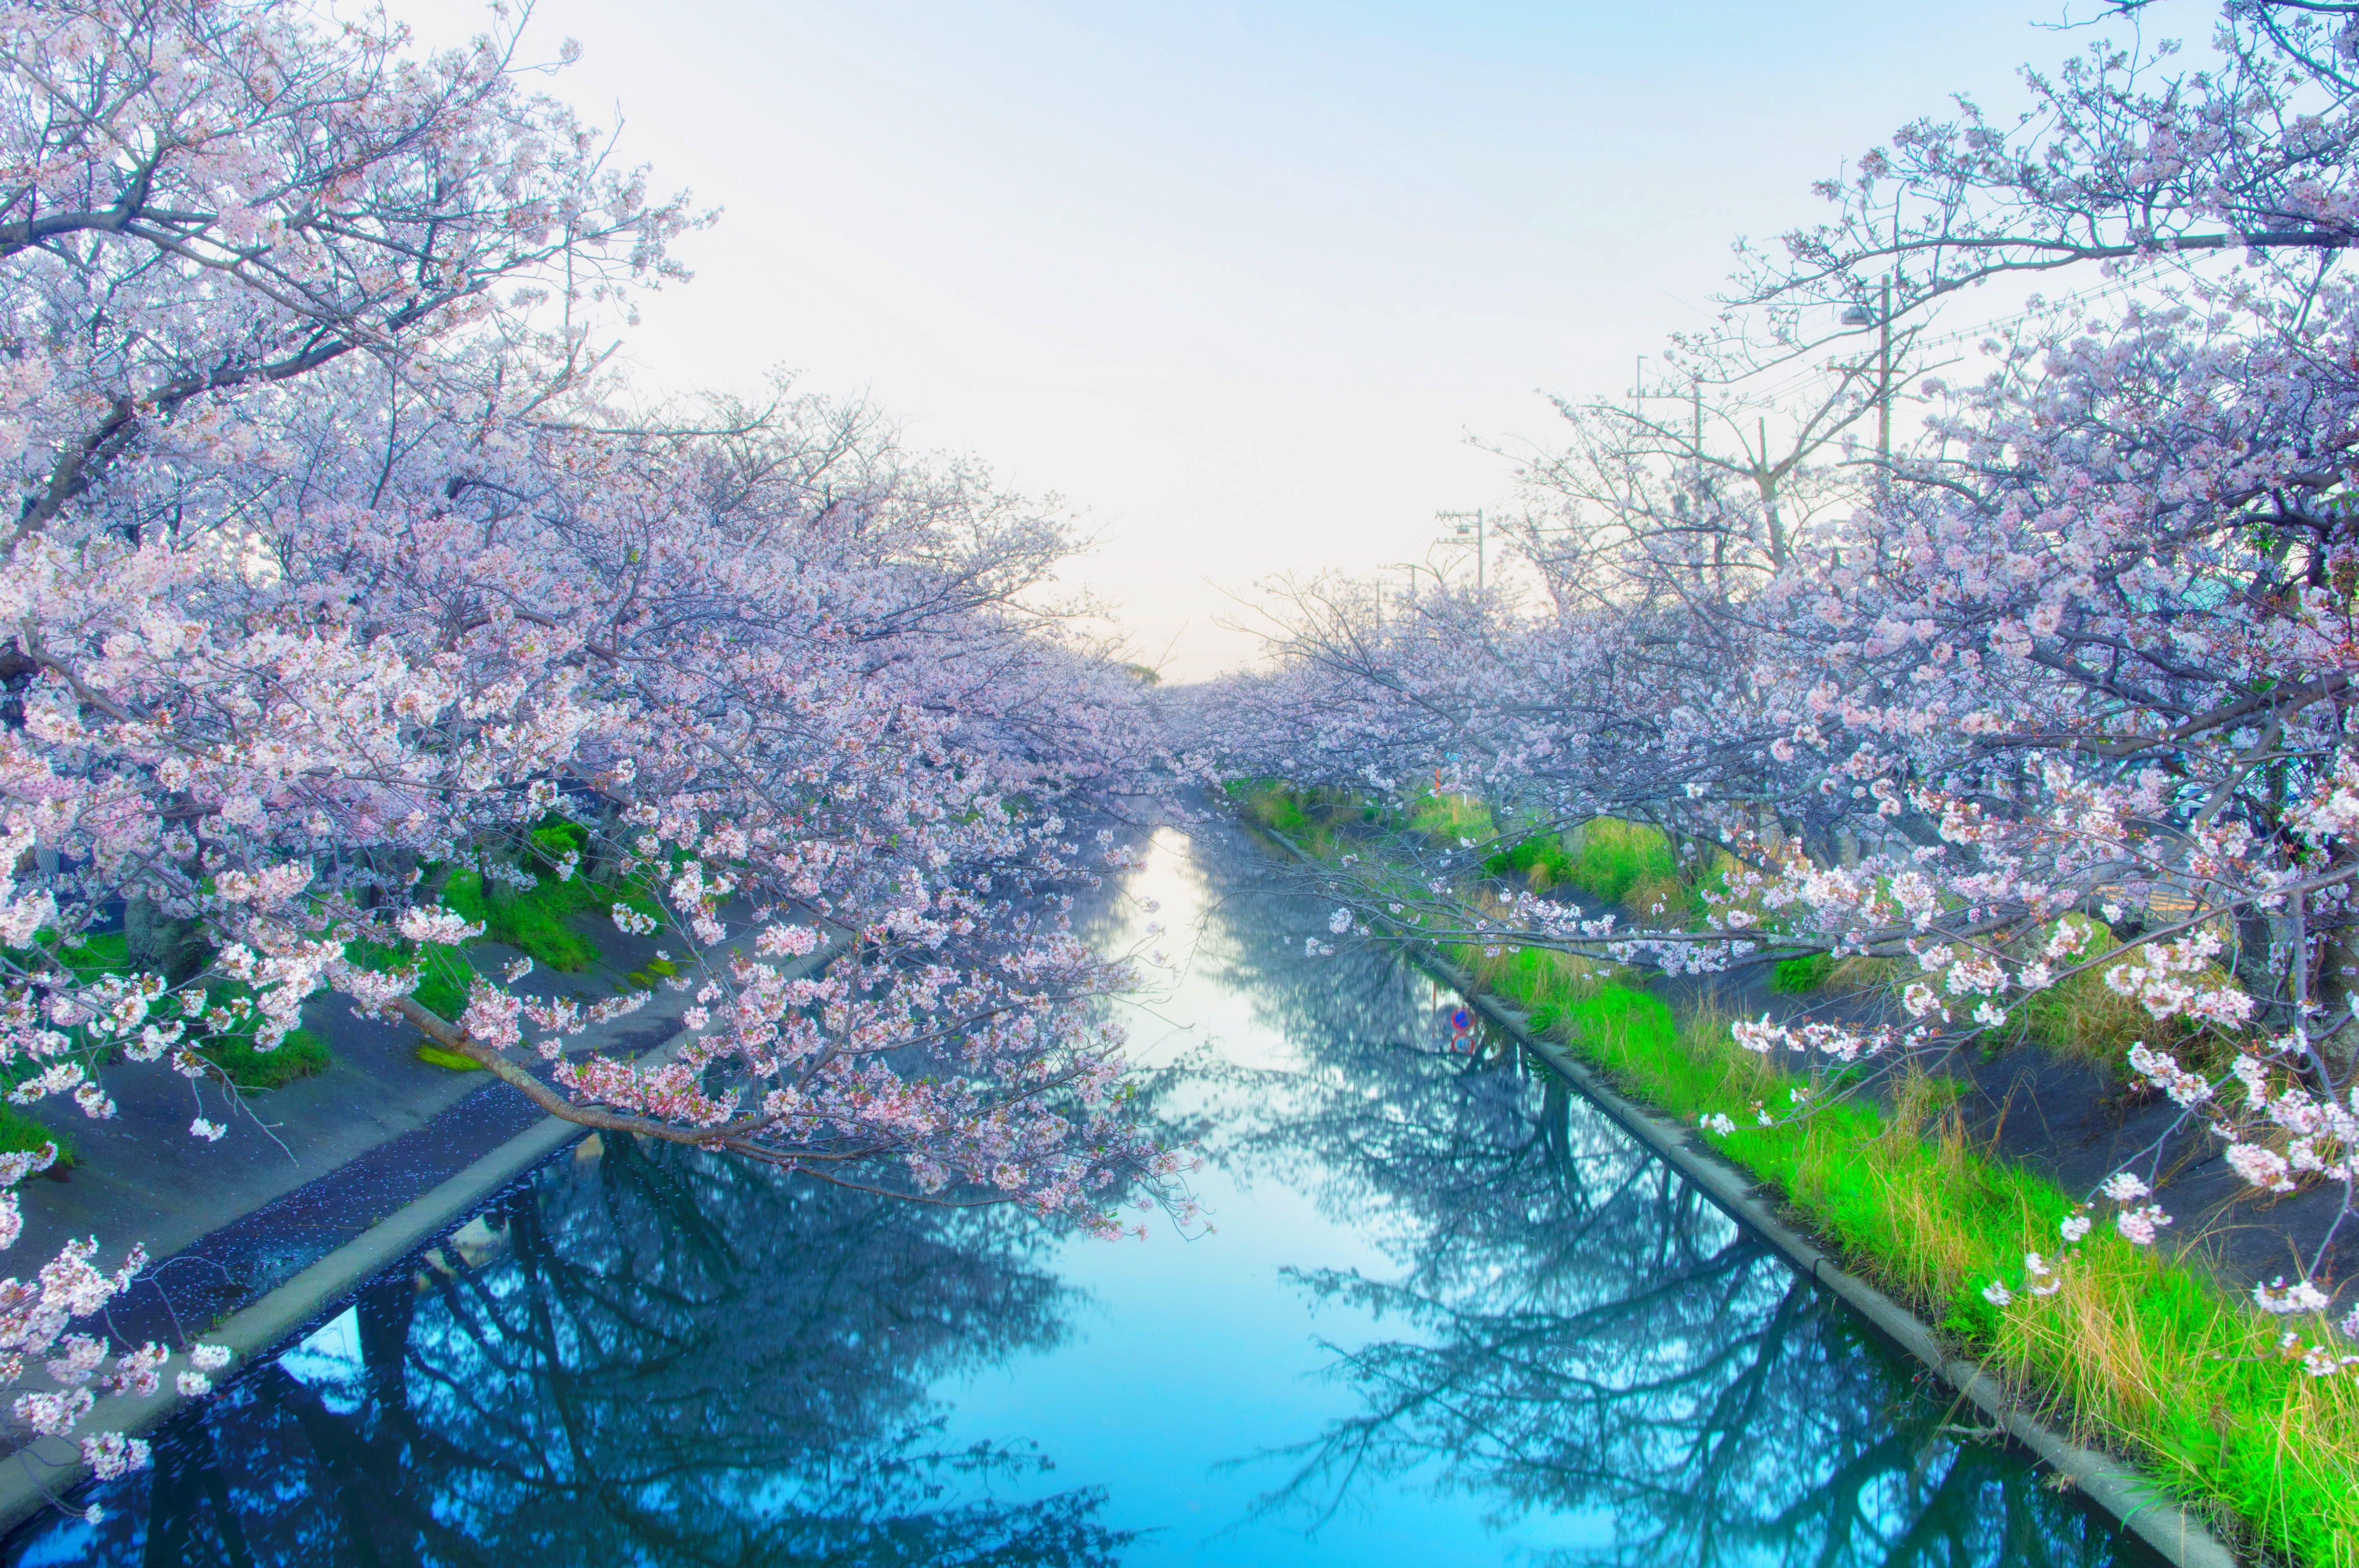 Cherry blossom tree near body of water japan cherry